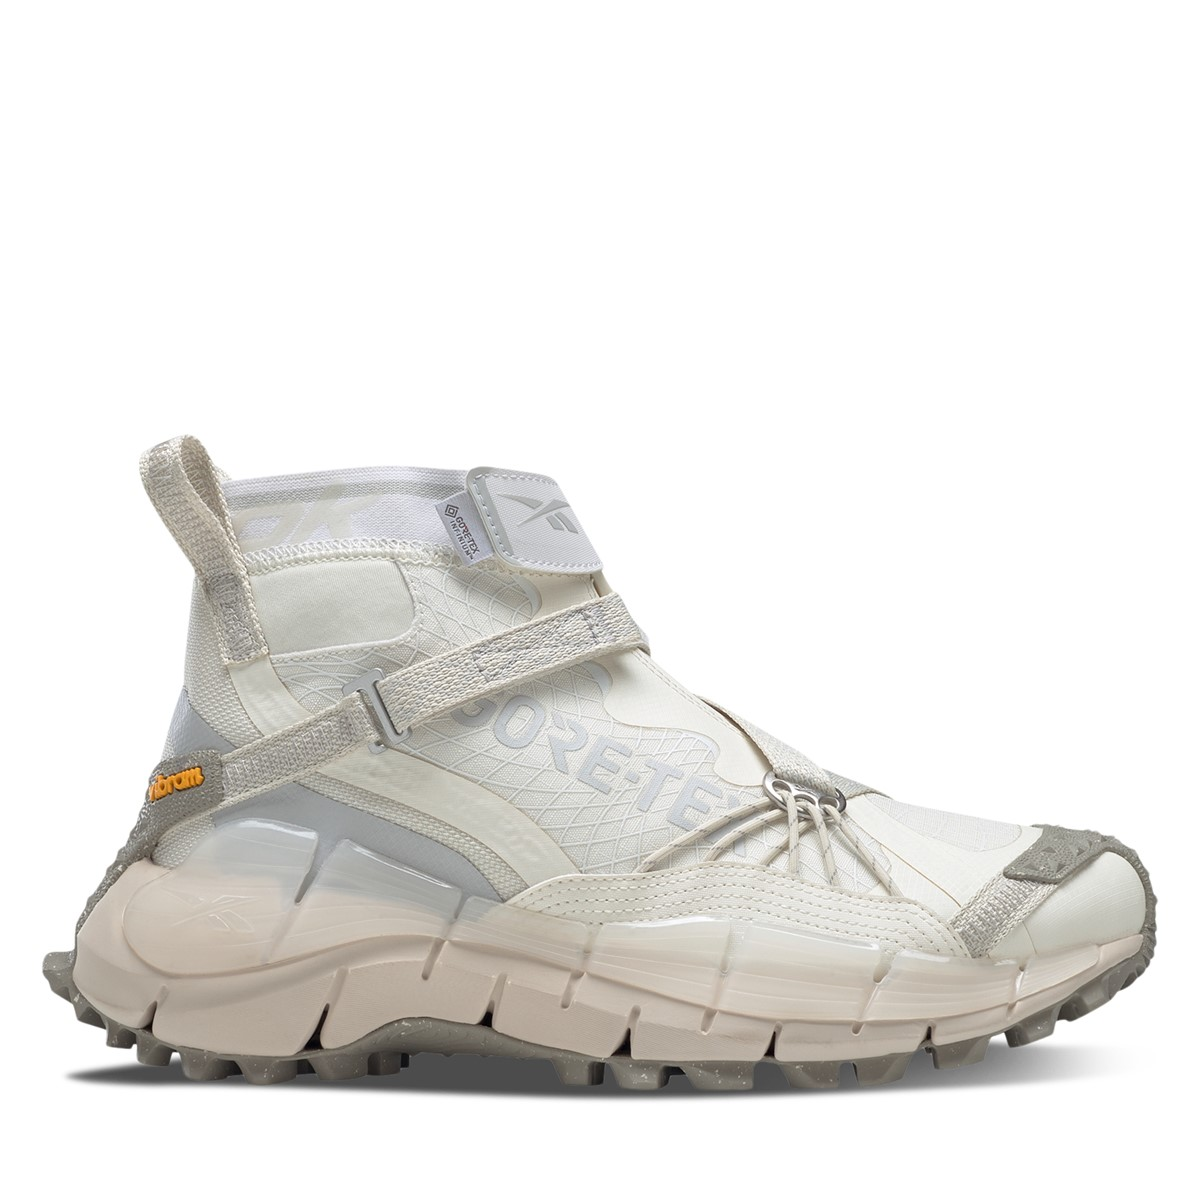 Zig Kinetica II Edge Gore-Tex Sneaker Boots in Chalk/ Grey/ White